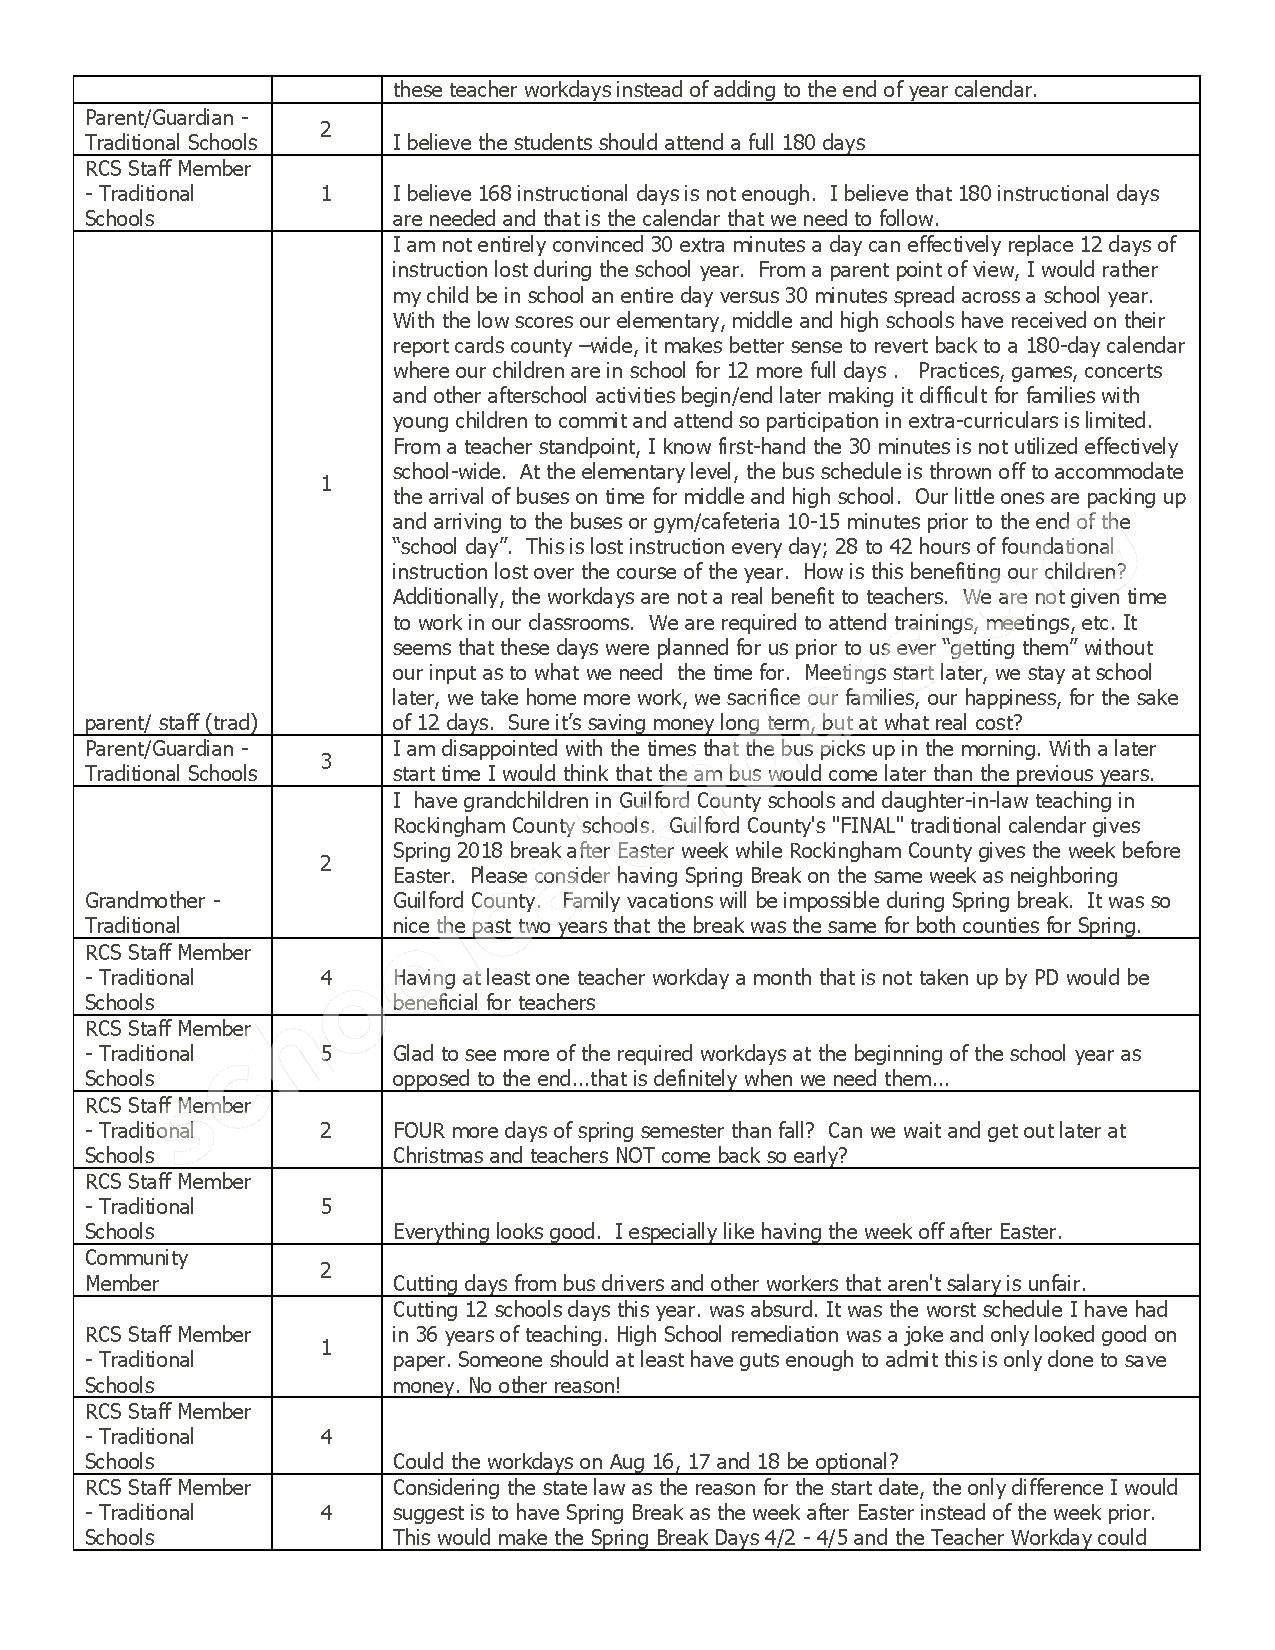 2017 - 2018 District Calendar – Rockingham County Schools – page 11